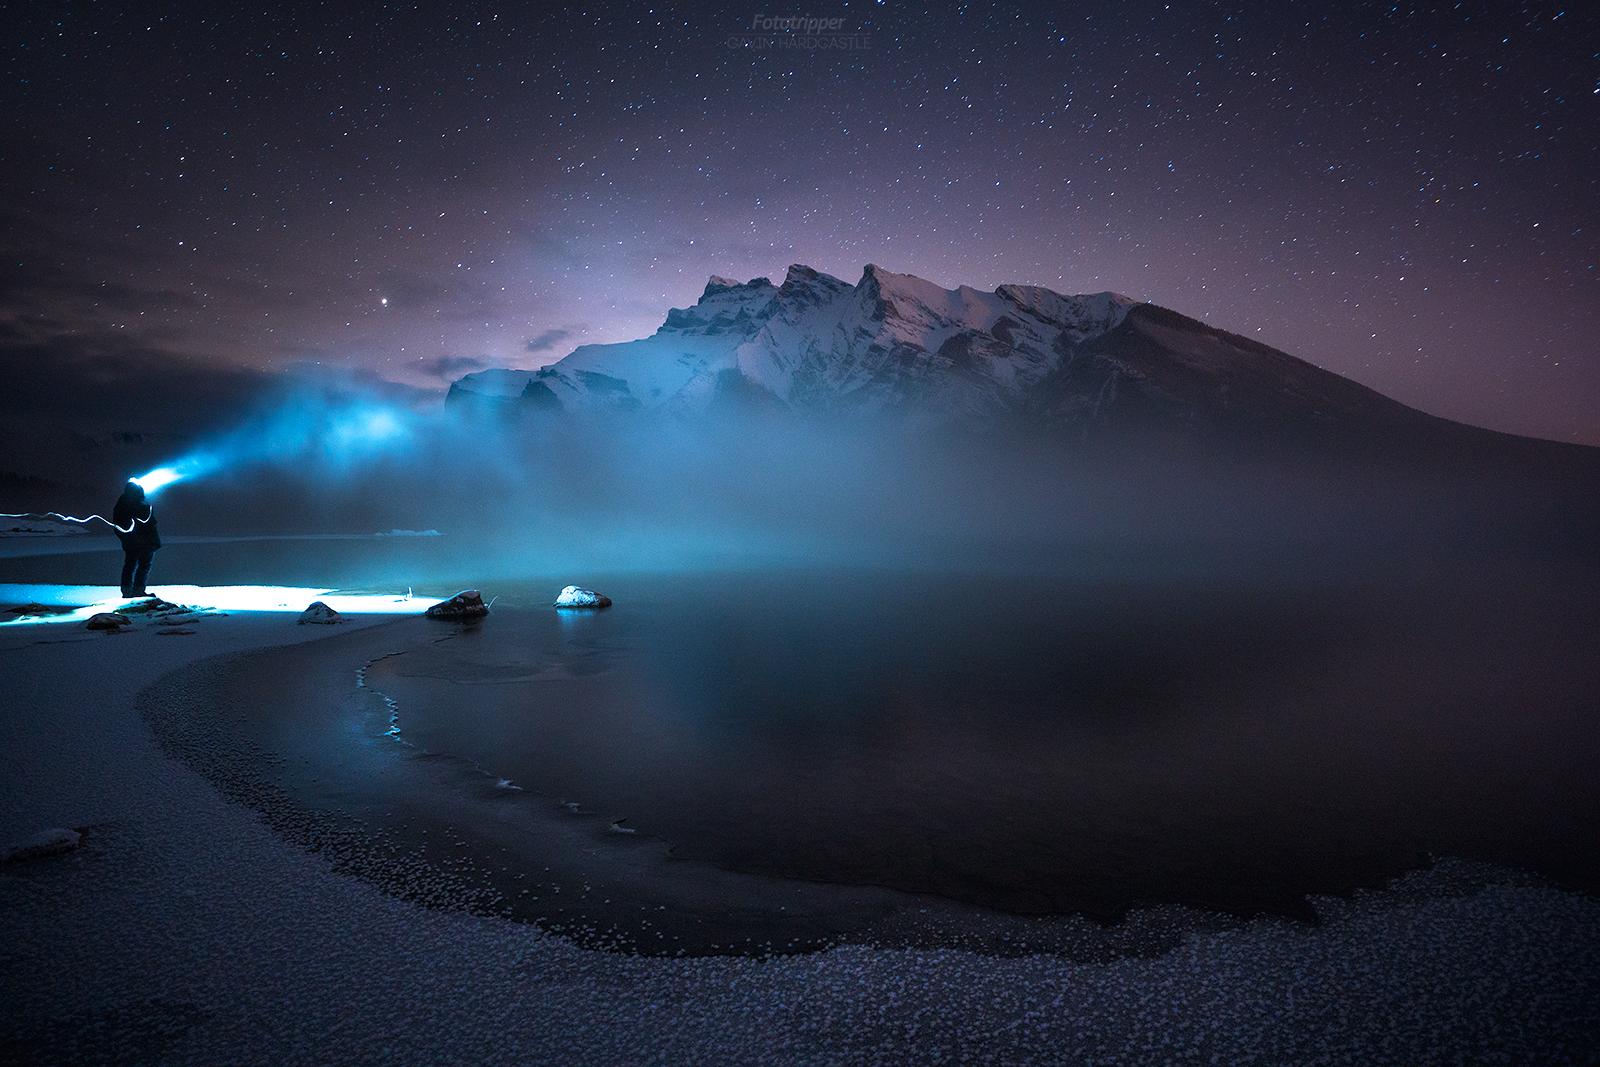 'The Abominable Ice Man' - Lake Minnewanka, Banff